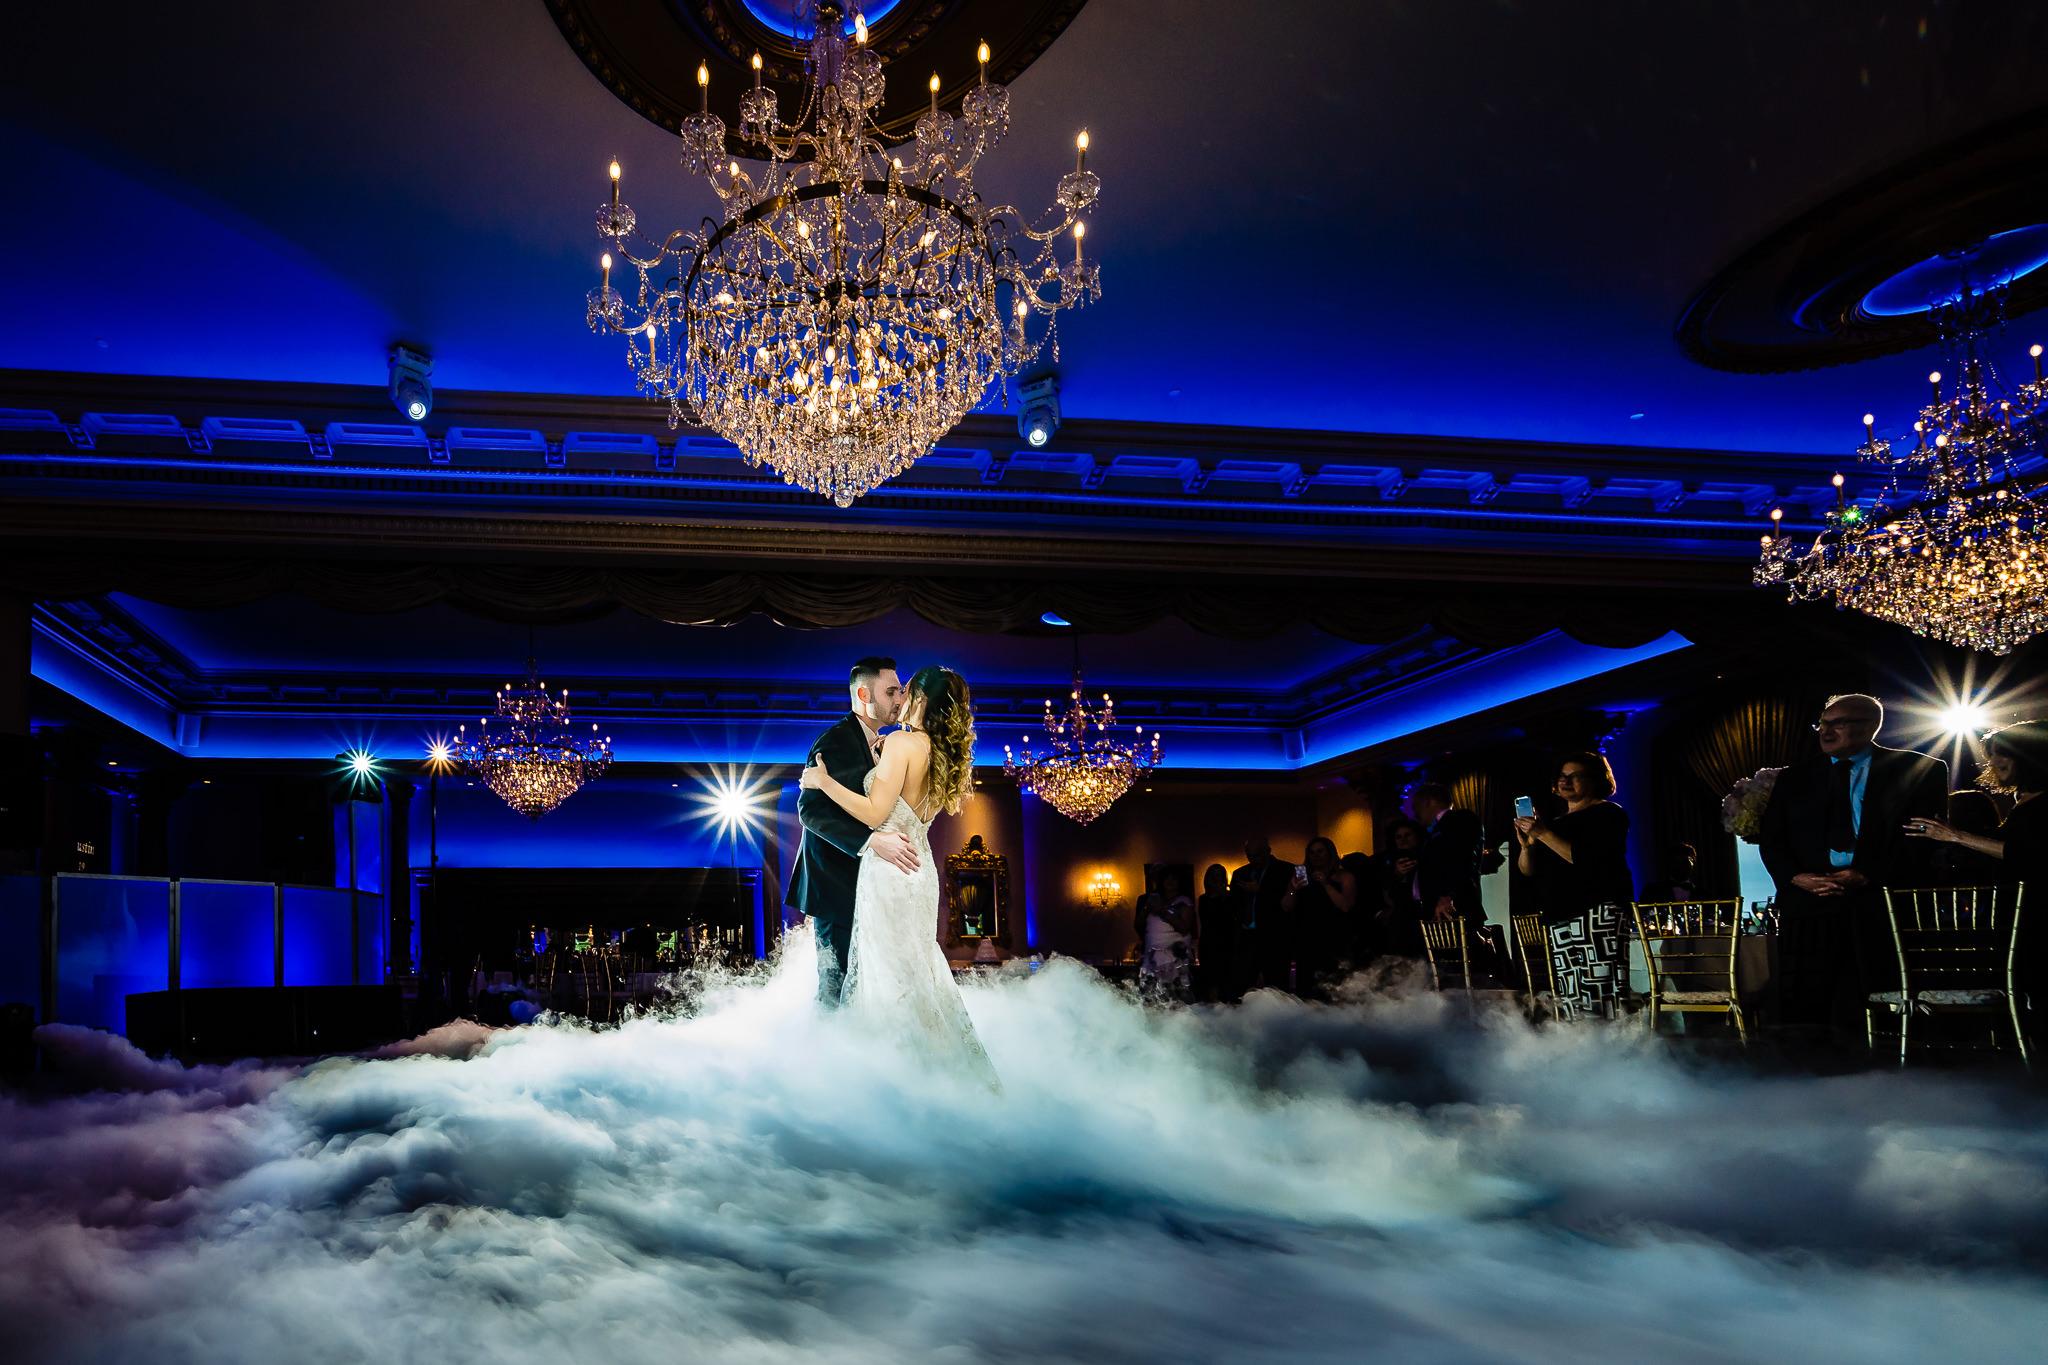 SMJ Photography, Wedding Photography, Wedding Photographer, Wedding Reception,First Dance, Smoke Effect, High Contrast Wedding Photography